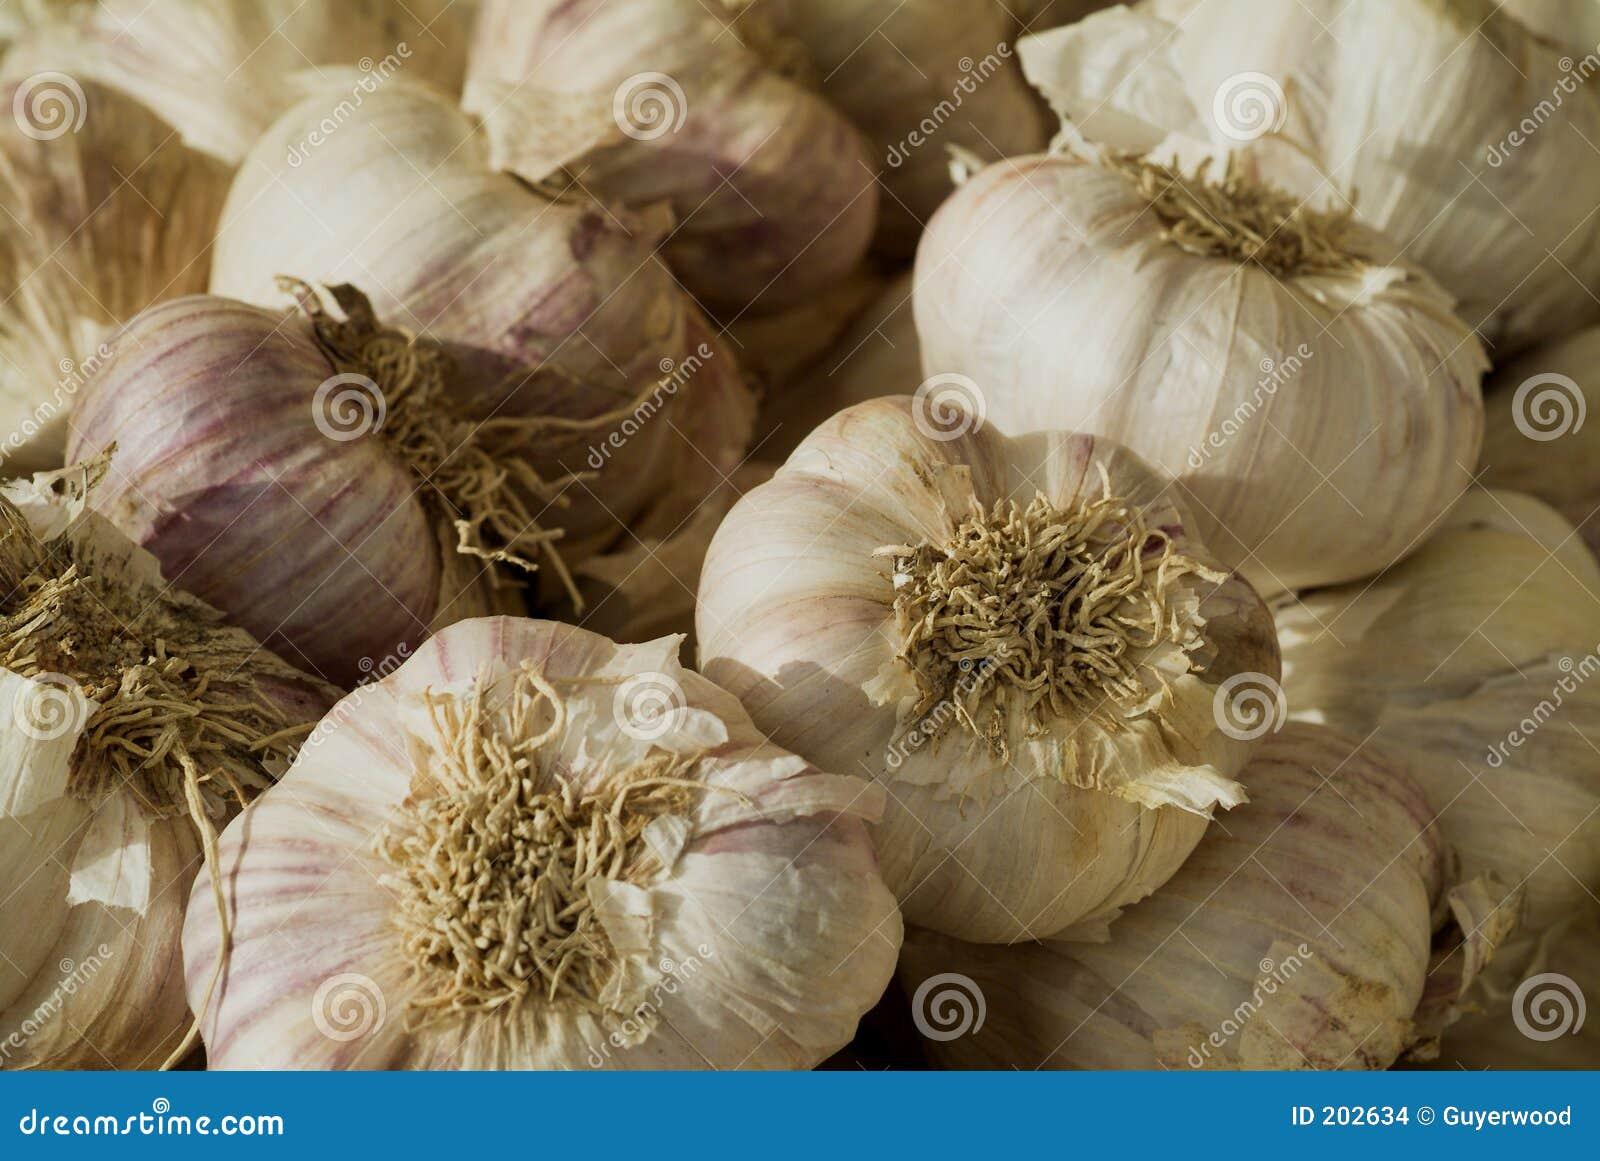 how to prepare fresh garlic cloves